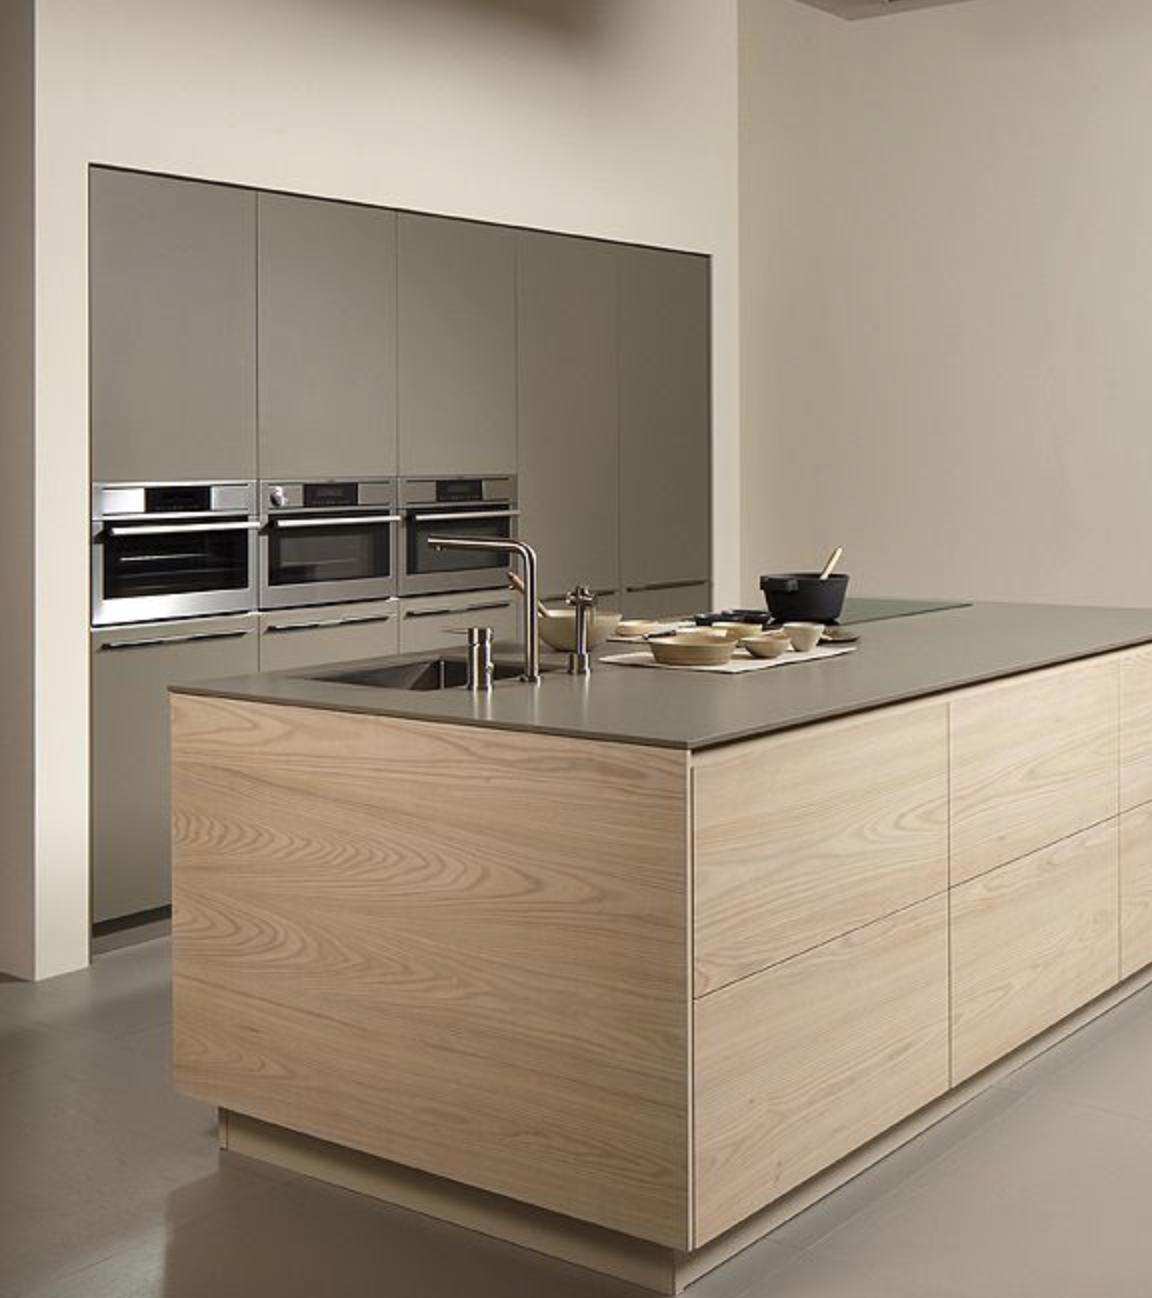 mink interior | Kitchen | Pinterest | Mink, Interiors and Kitchens